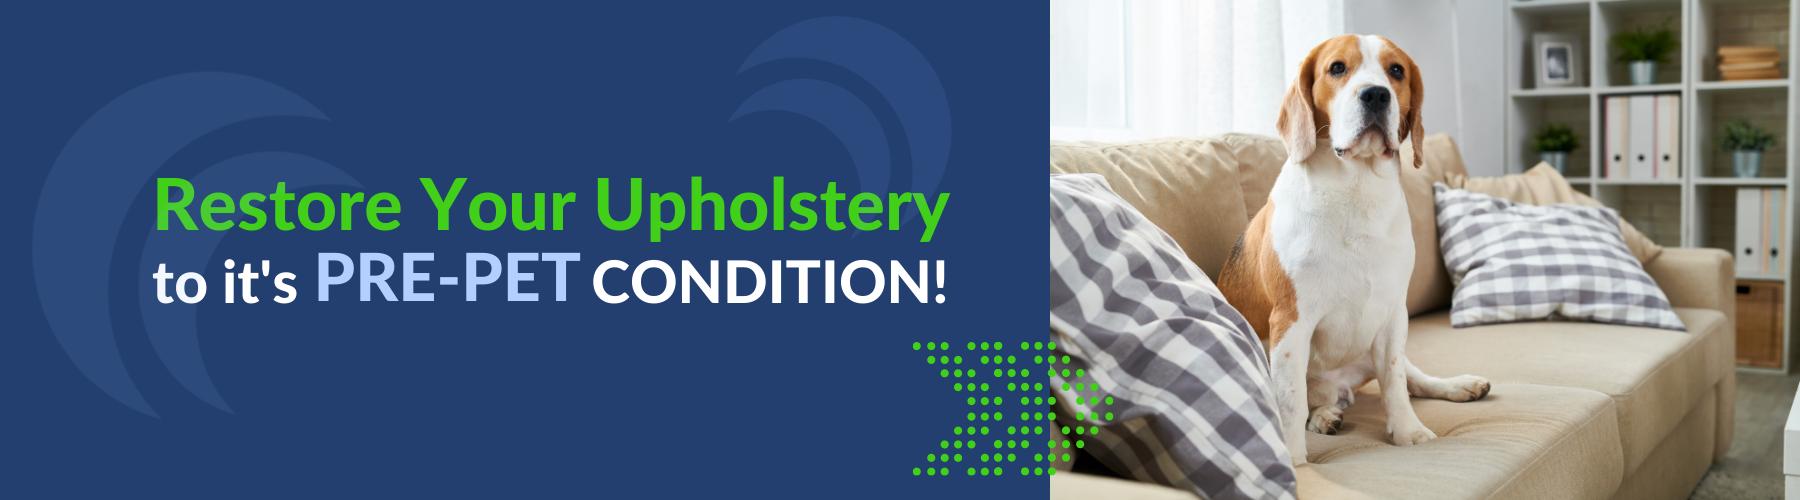 restore upholstery